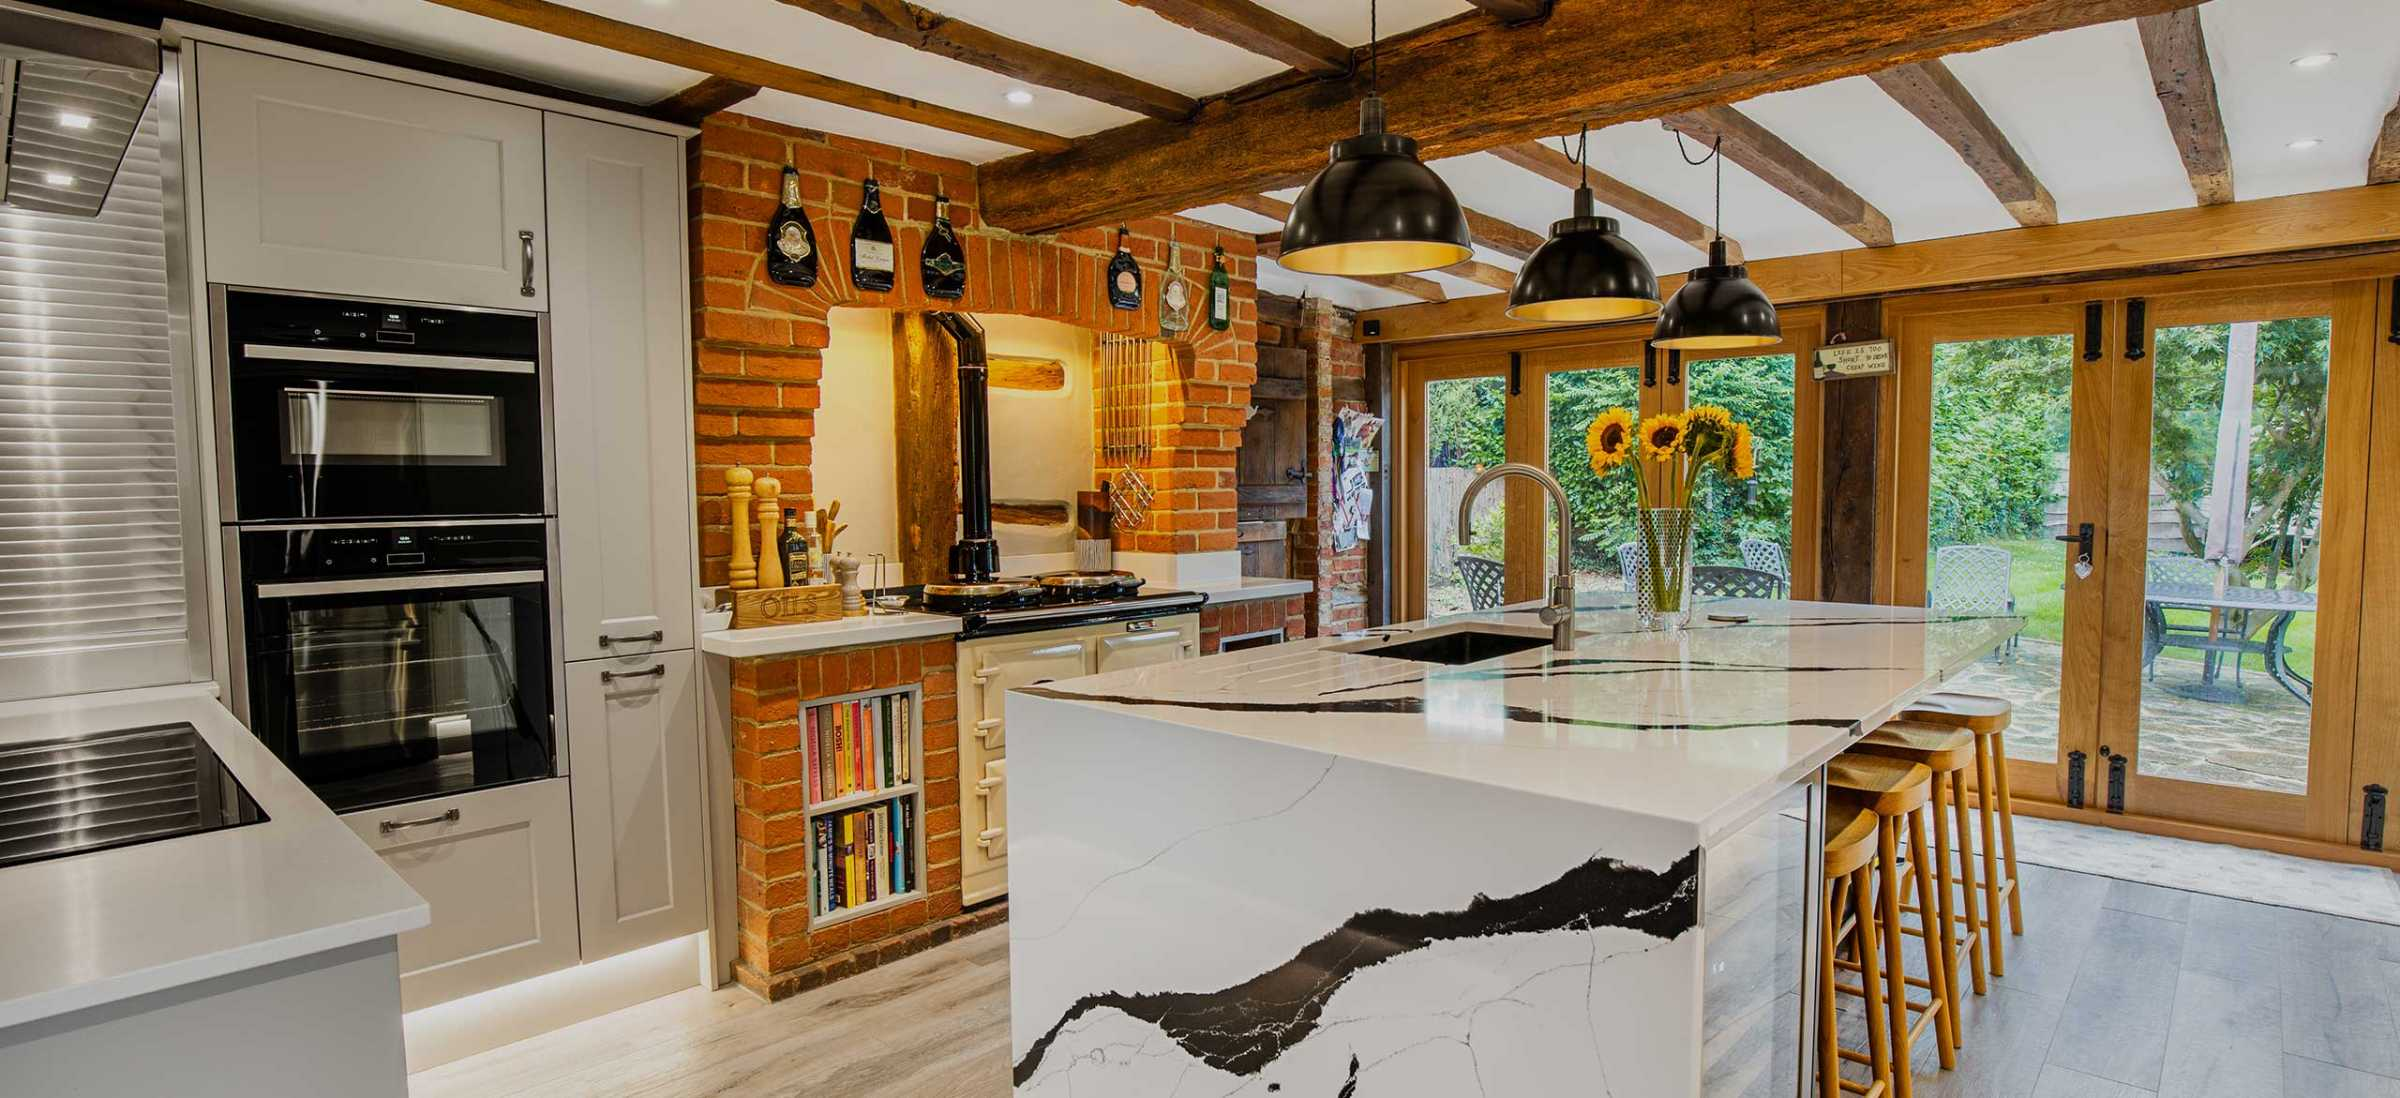 Horsham Kitchen Painted Shaker